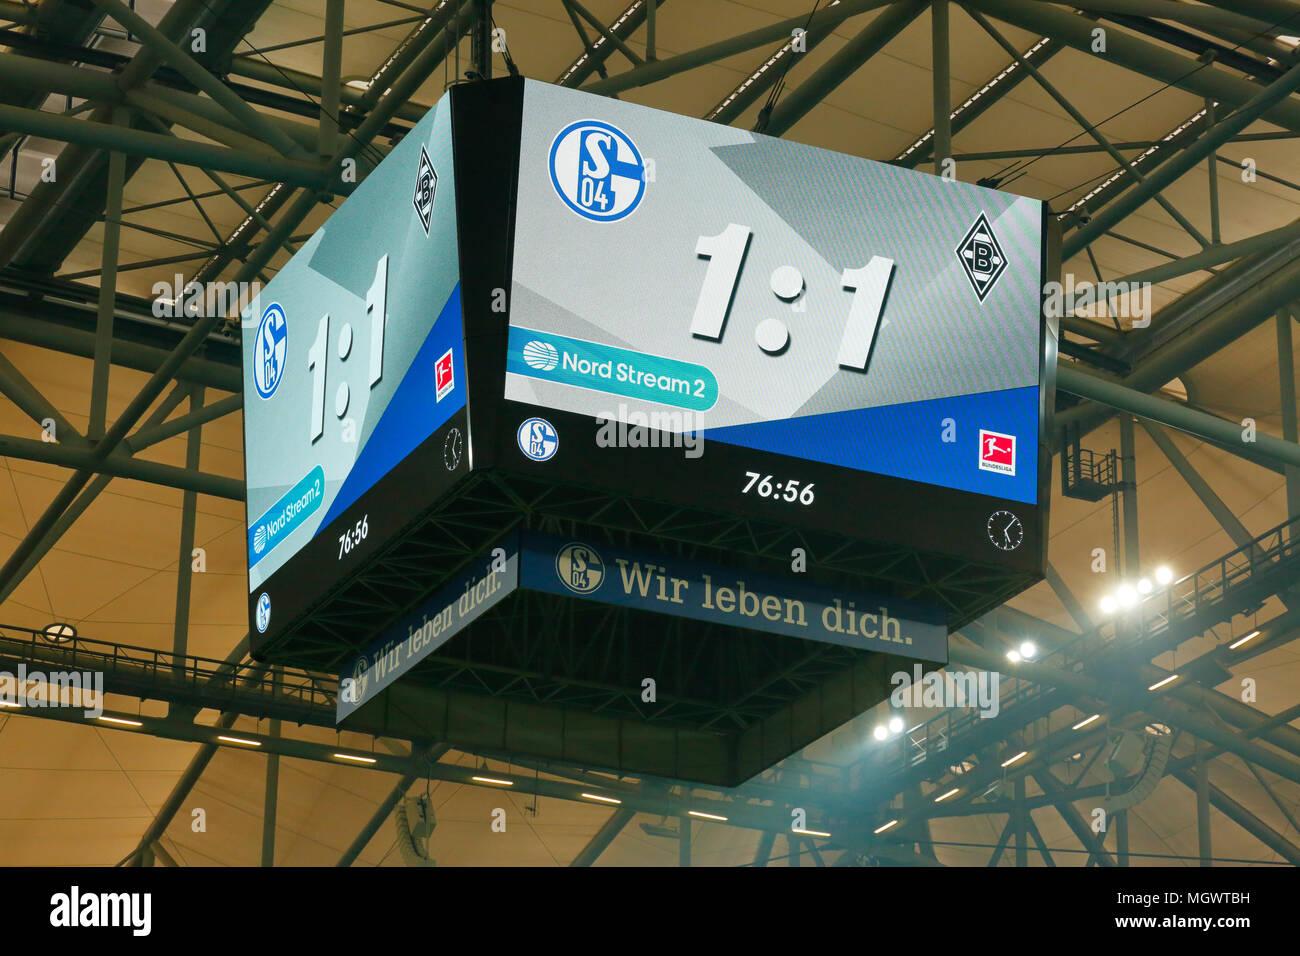 sports, football, Bundesliga, 2017/2018, FC Schalke 04 vs Borussia Moenchengladbach 1:1, Veltins Arena Gelsenkirchen, video cube, scoreboard, informations to the visitors - Stock Image